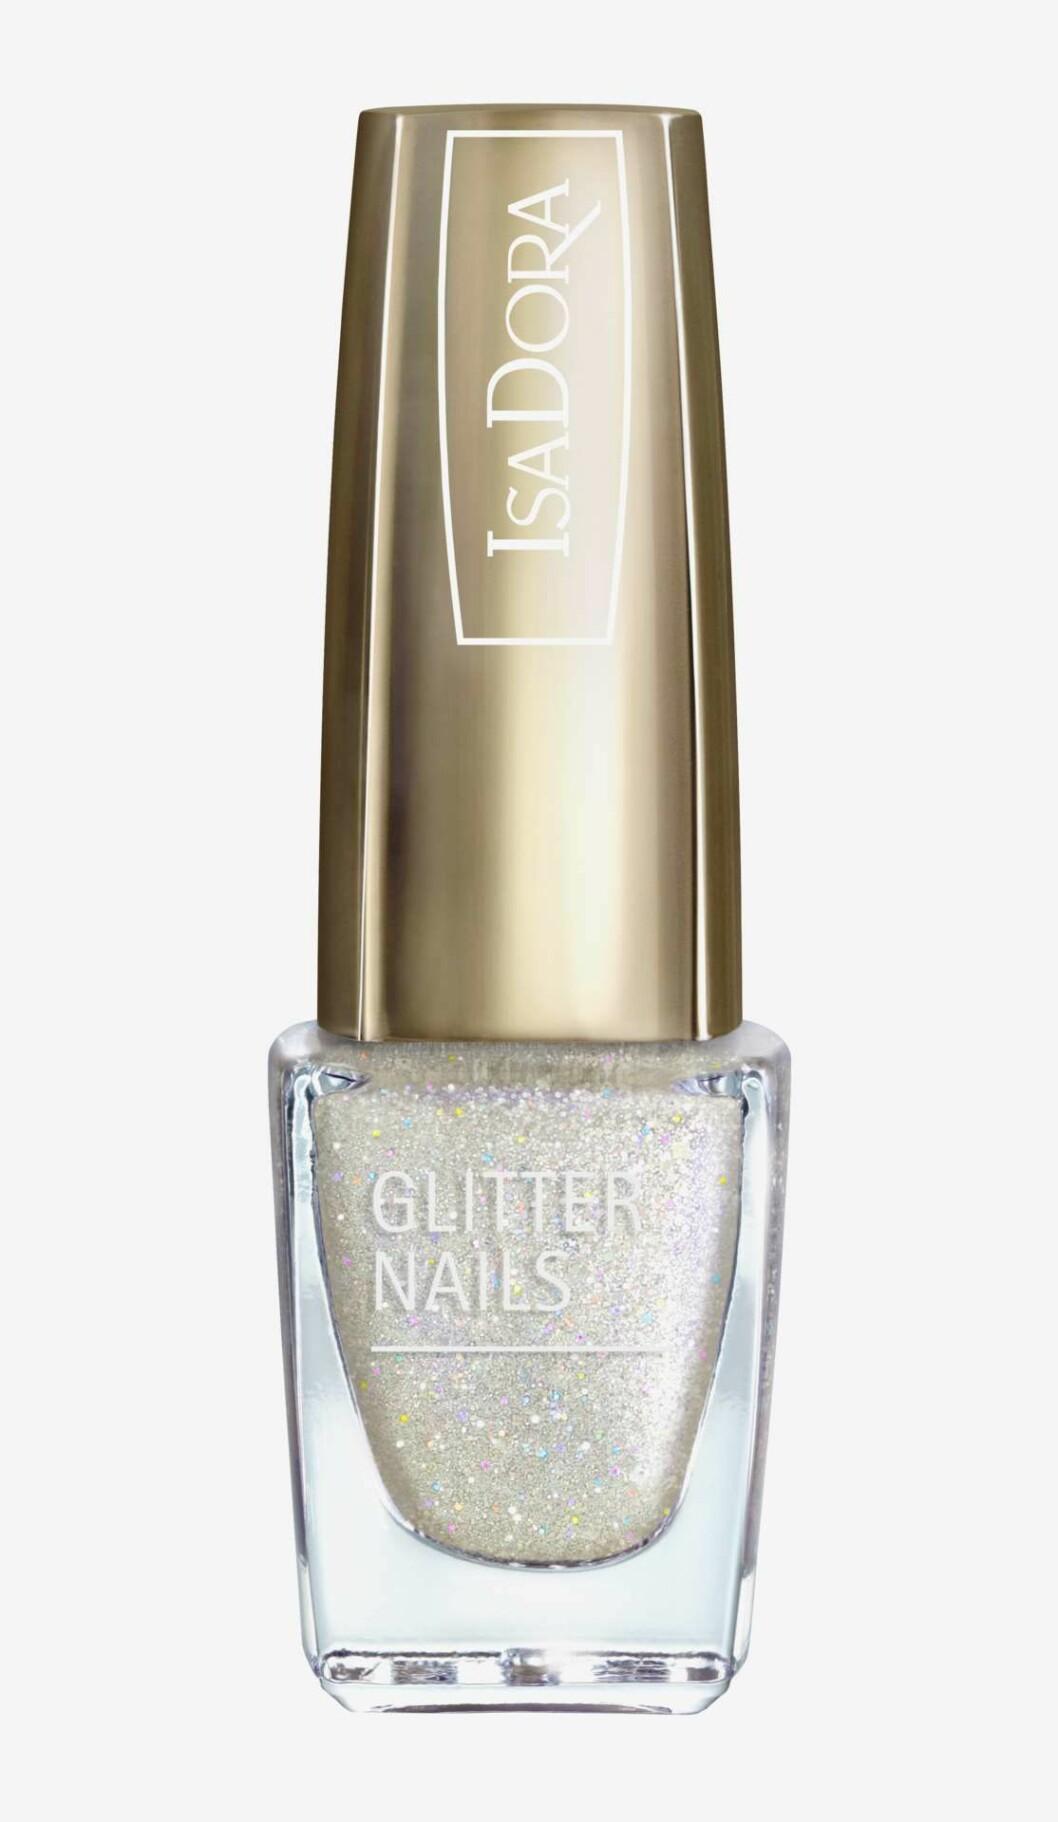 ISadora nagellack Glitter nails